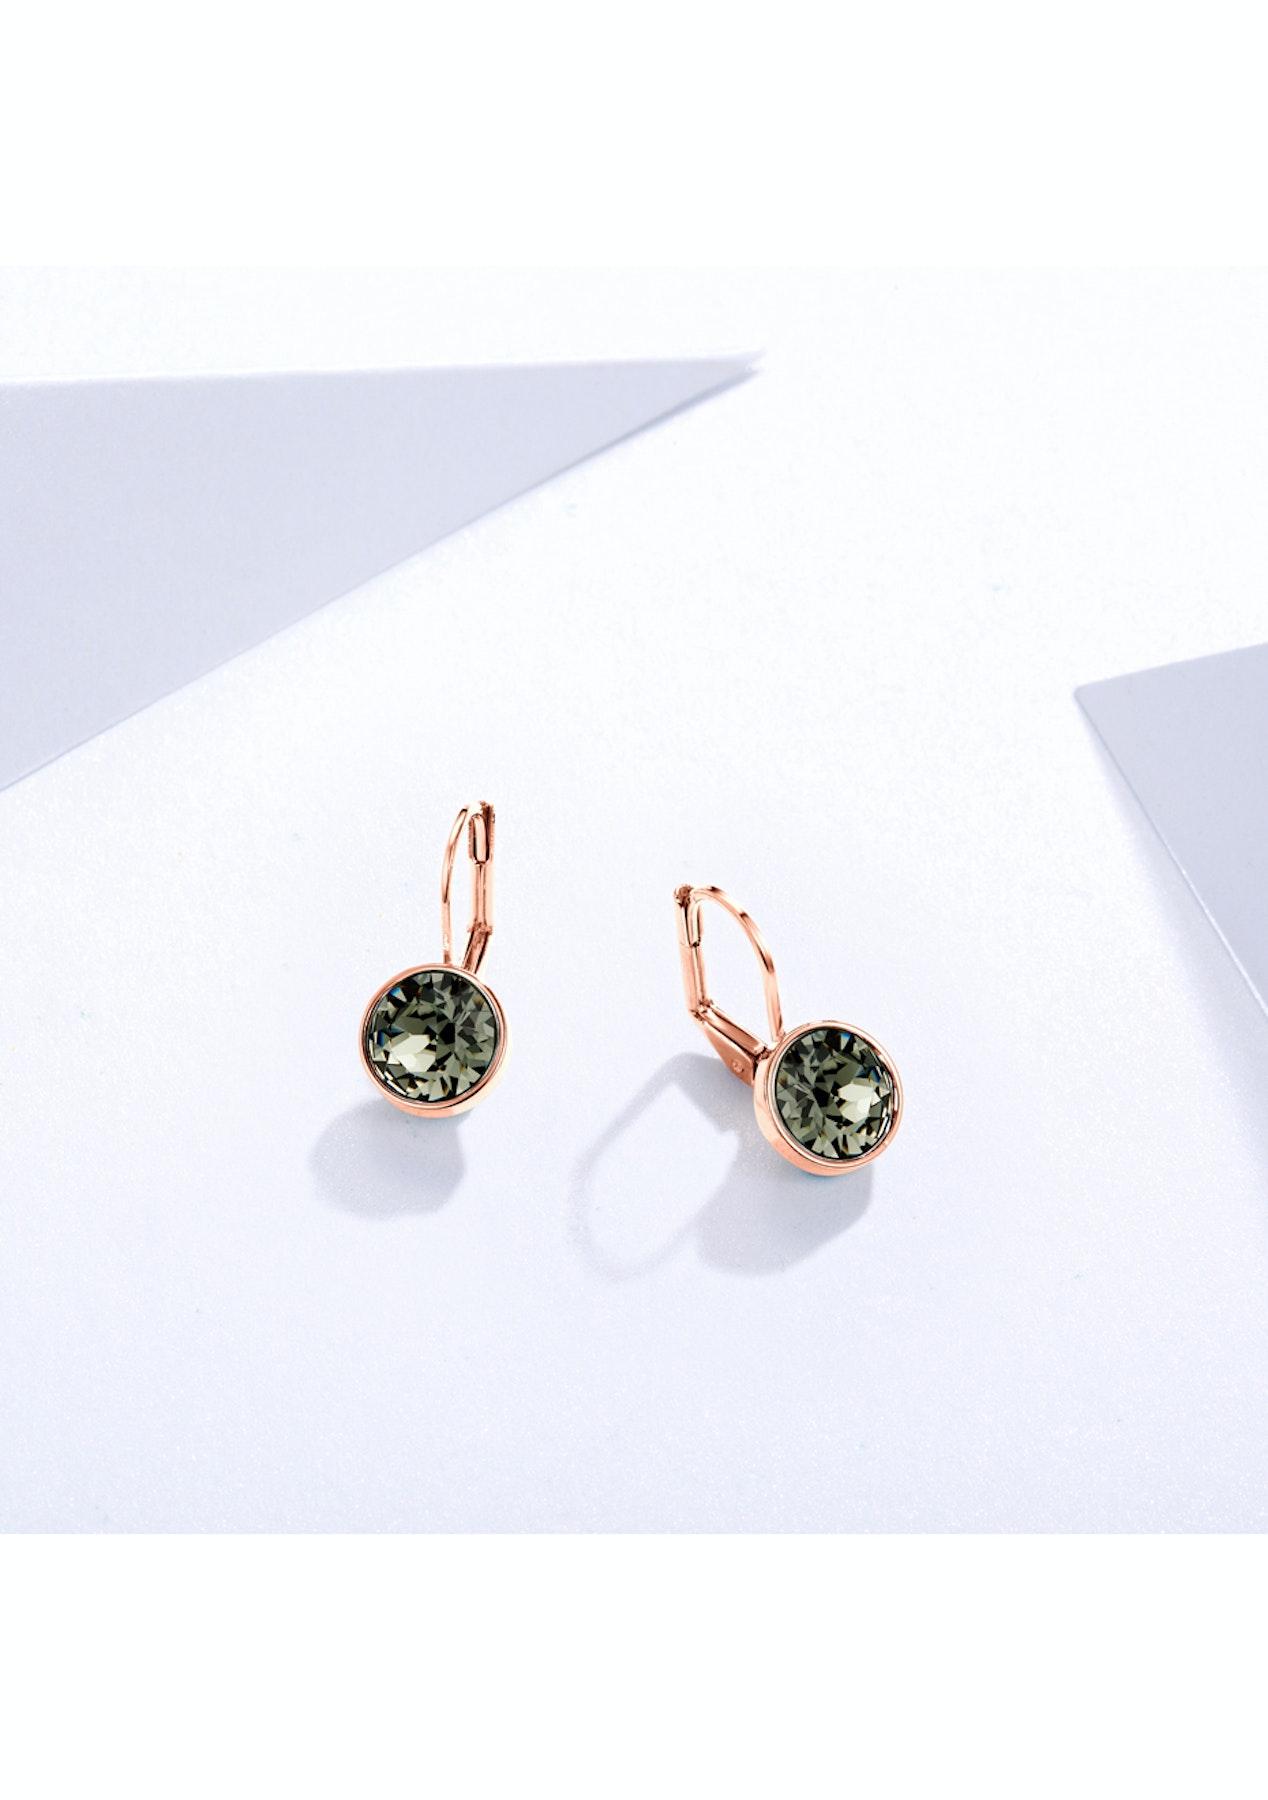 e84848691 Krystal Cotoure - Bella Earrings with 2 Carat Swarovski Black Diamond  Crystals Rose Gold Plated - My Jewellery Store Swarovski Elements Jewellery  Under $40 ...